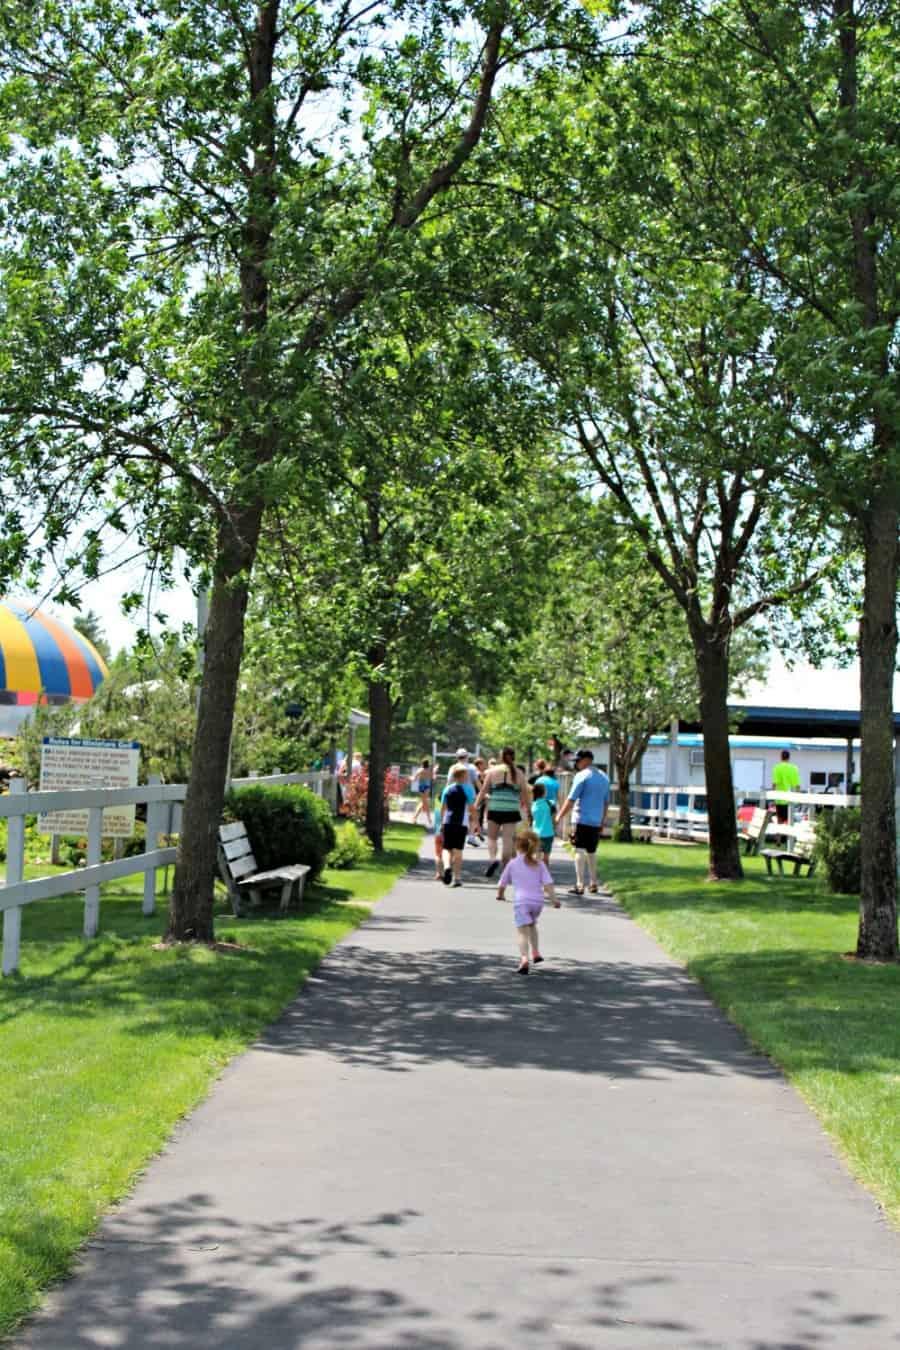 SummerLand, Central Minnesota's Outdoor Fun Park